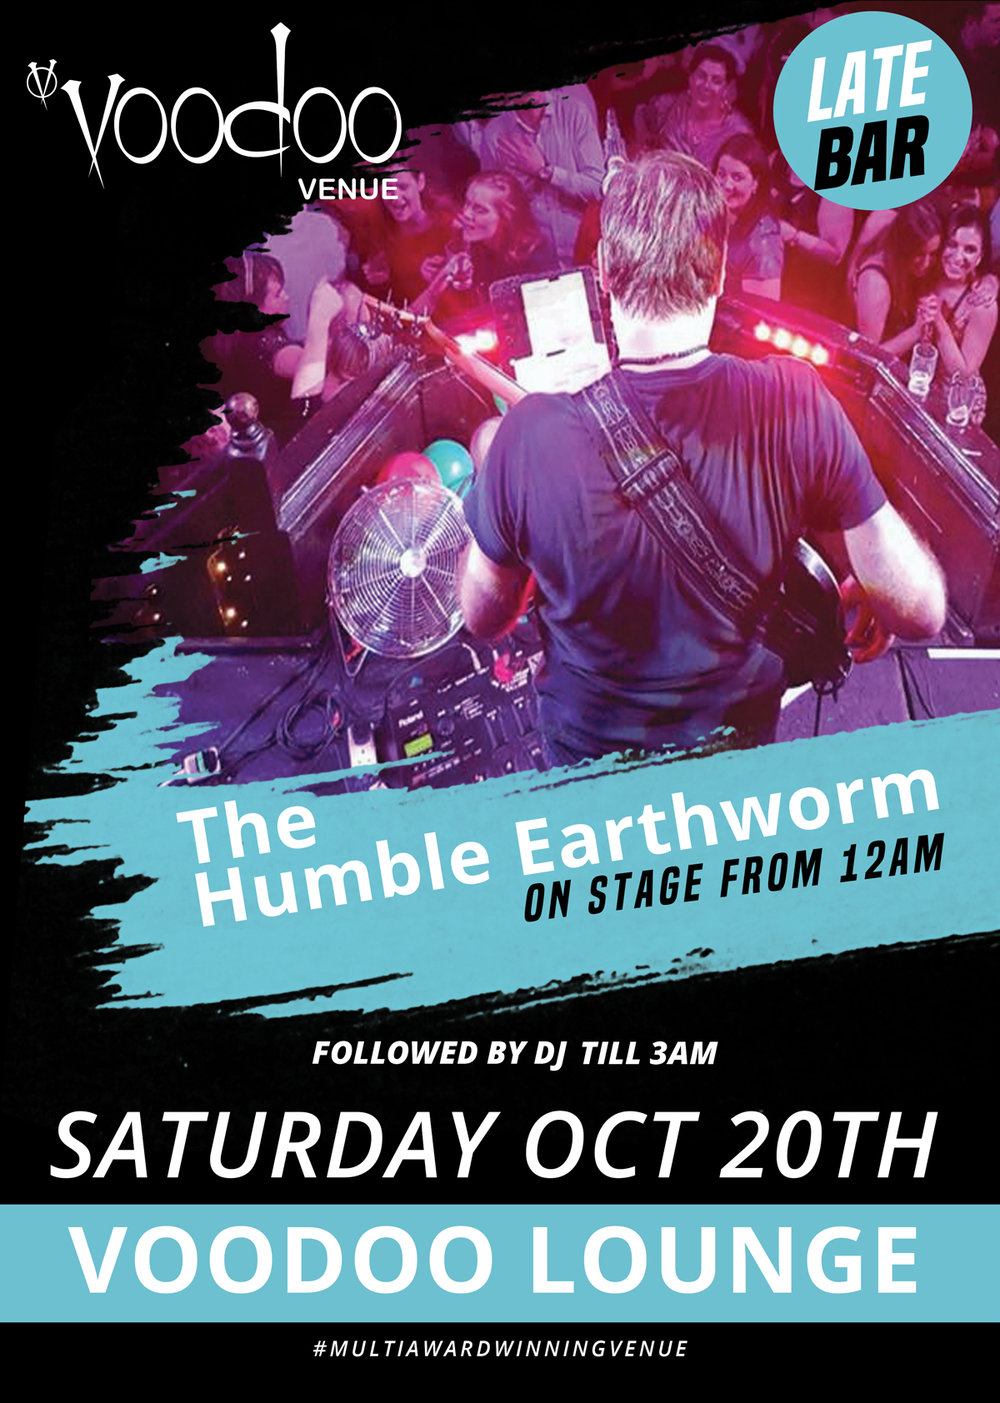 voodoo-venue---live-lounge-humble-earthworms-sat-oct-20-2018.jpg